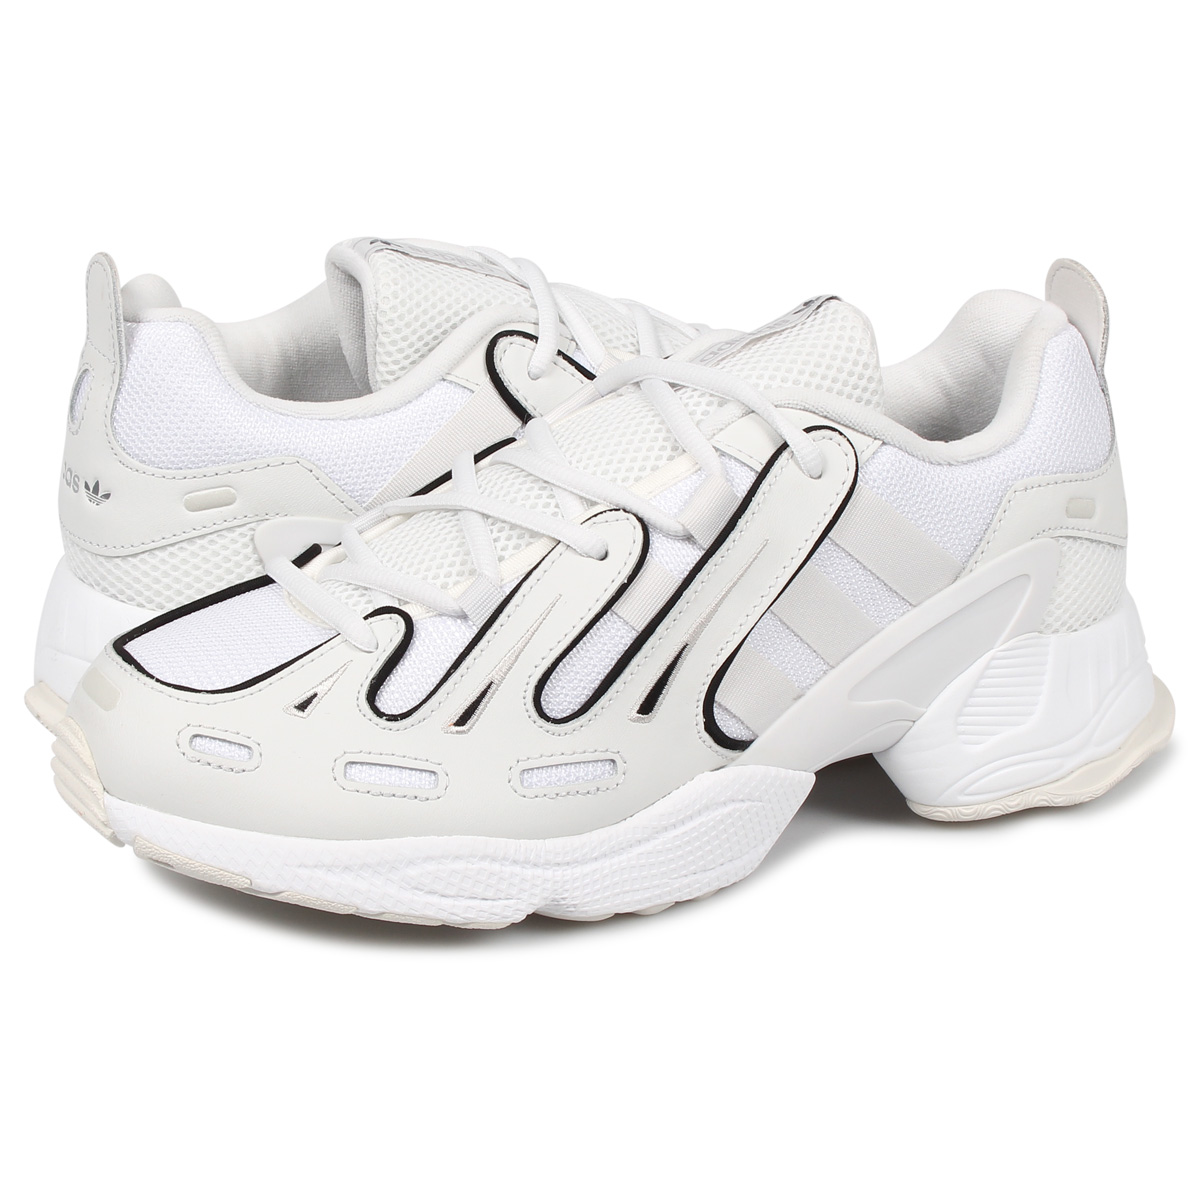 adidas Originals EQT GAZELLE アディダス オリジナルス ガゼル スニーカー メンズ ガッツレー ホワイト 白 EE7744